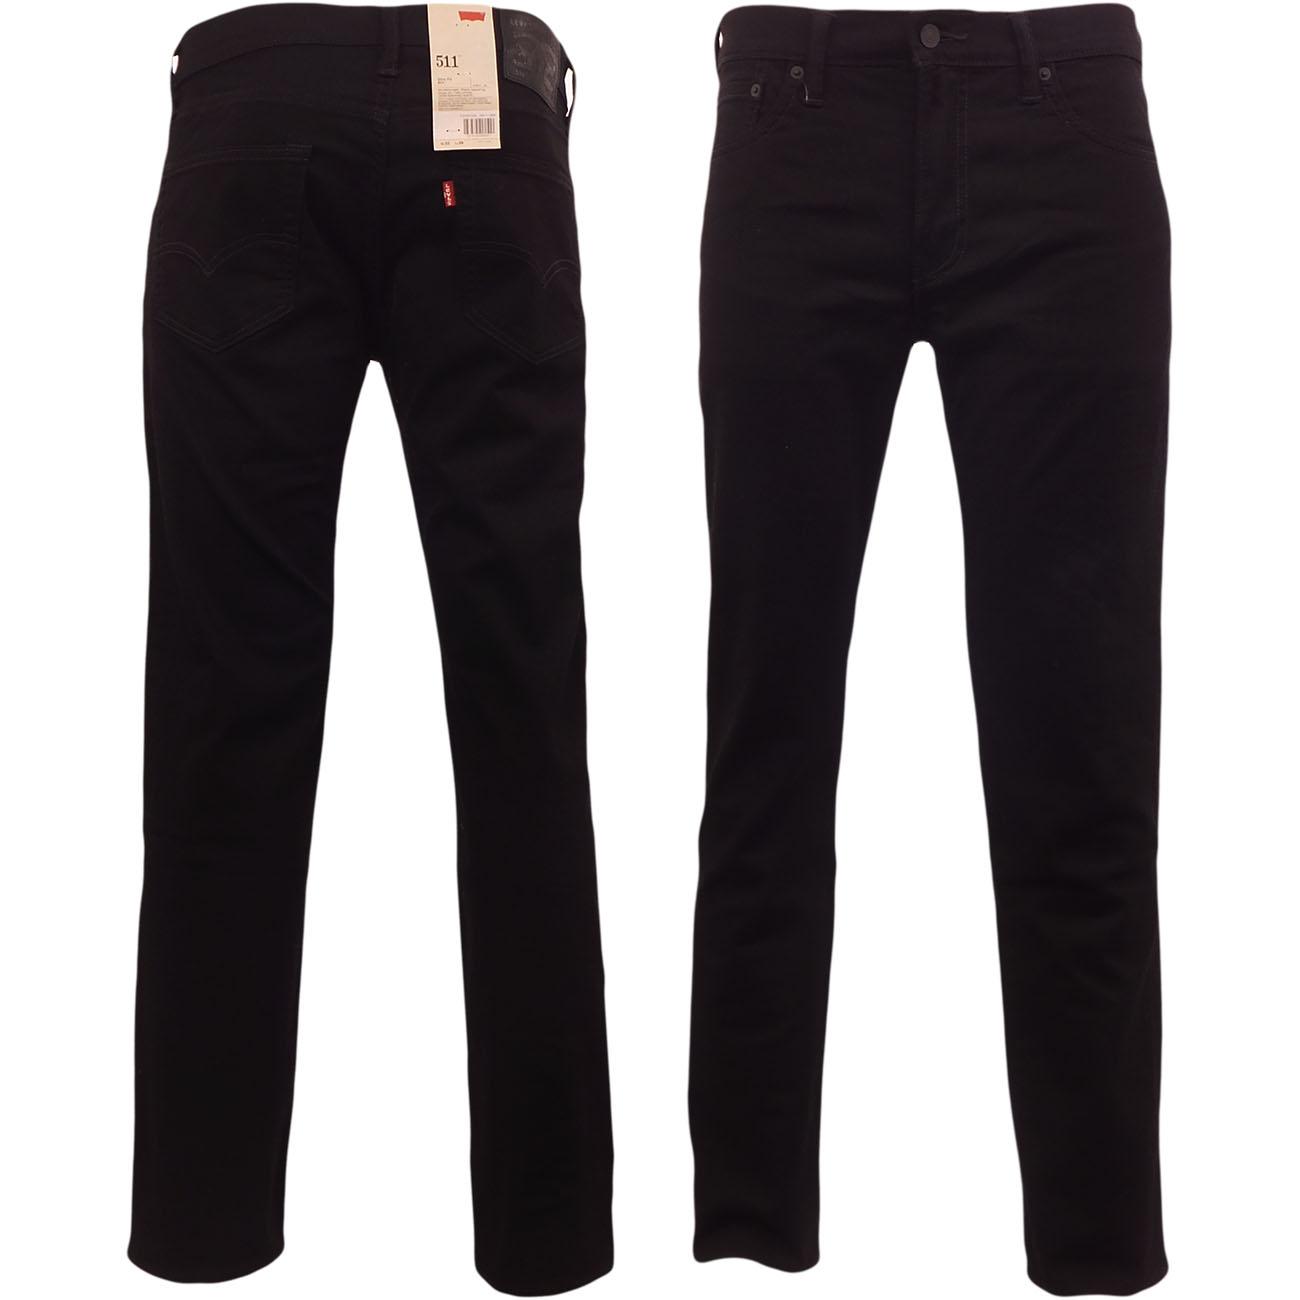 d6148c130b6b Details about Levi's 511 Jeans Original Levi Strauss Slim Fit Black Waist  30 32 34 36